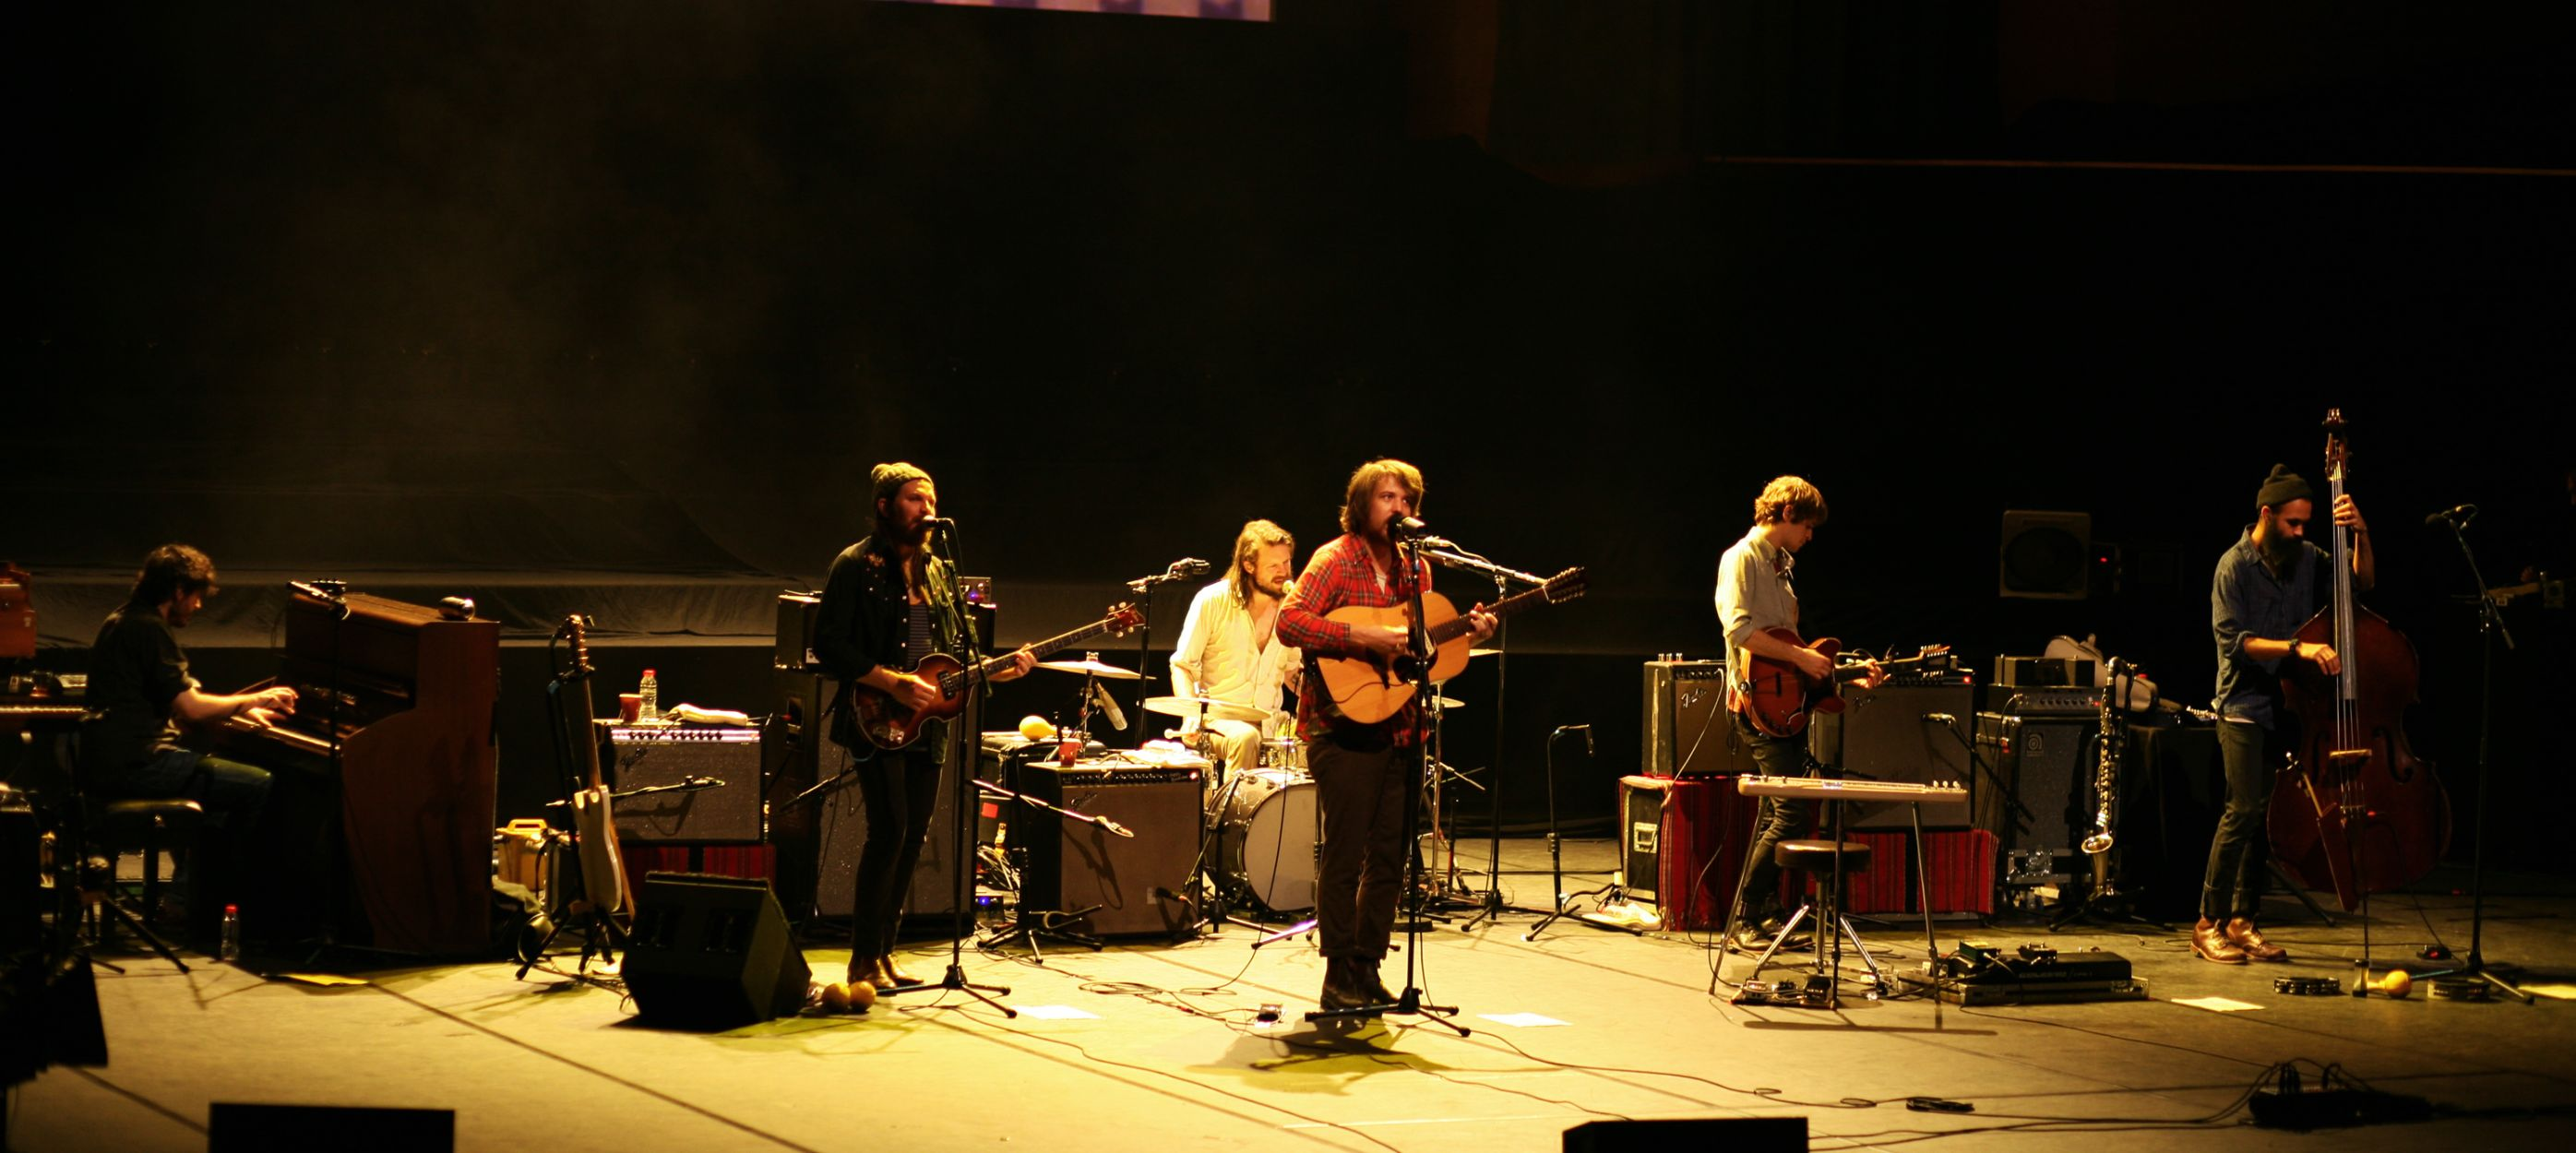 Fleet Foxes. Auditori de Barcelona, 27/11/2011